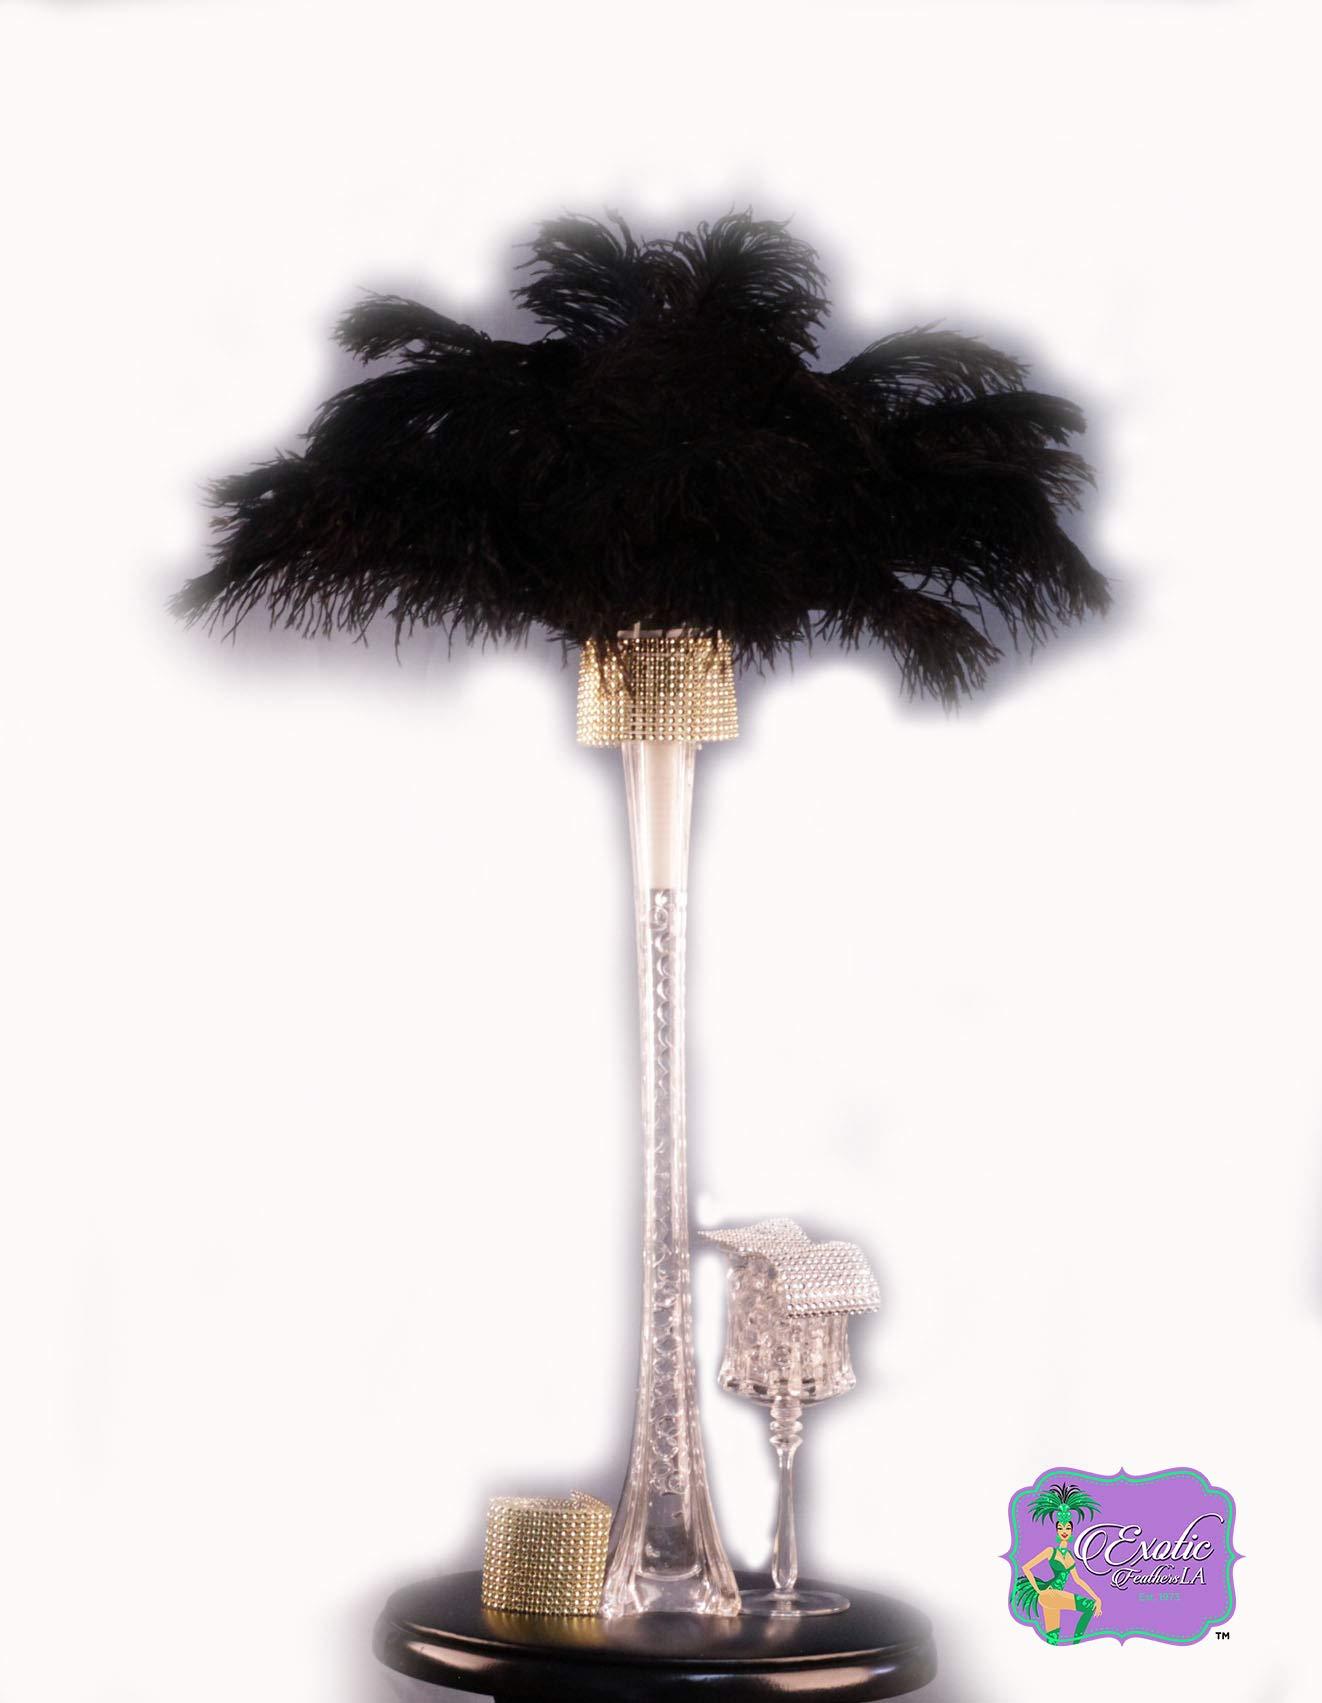 Special Sale 100 Pcs. BLACK OSTRICH Feathers Wholesale Bulk 13/18'' long DELUXE FEATHERS by Exotic Feathers LA est. 1973 (Image #3)